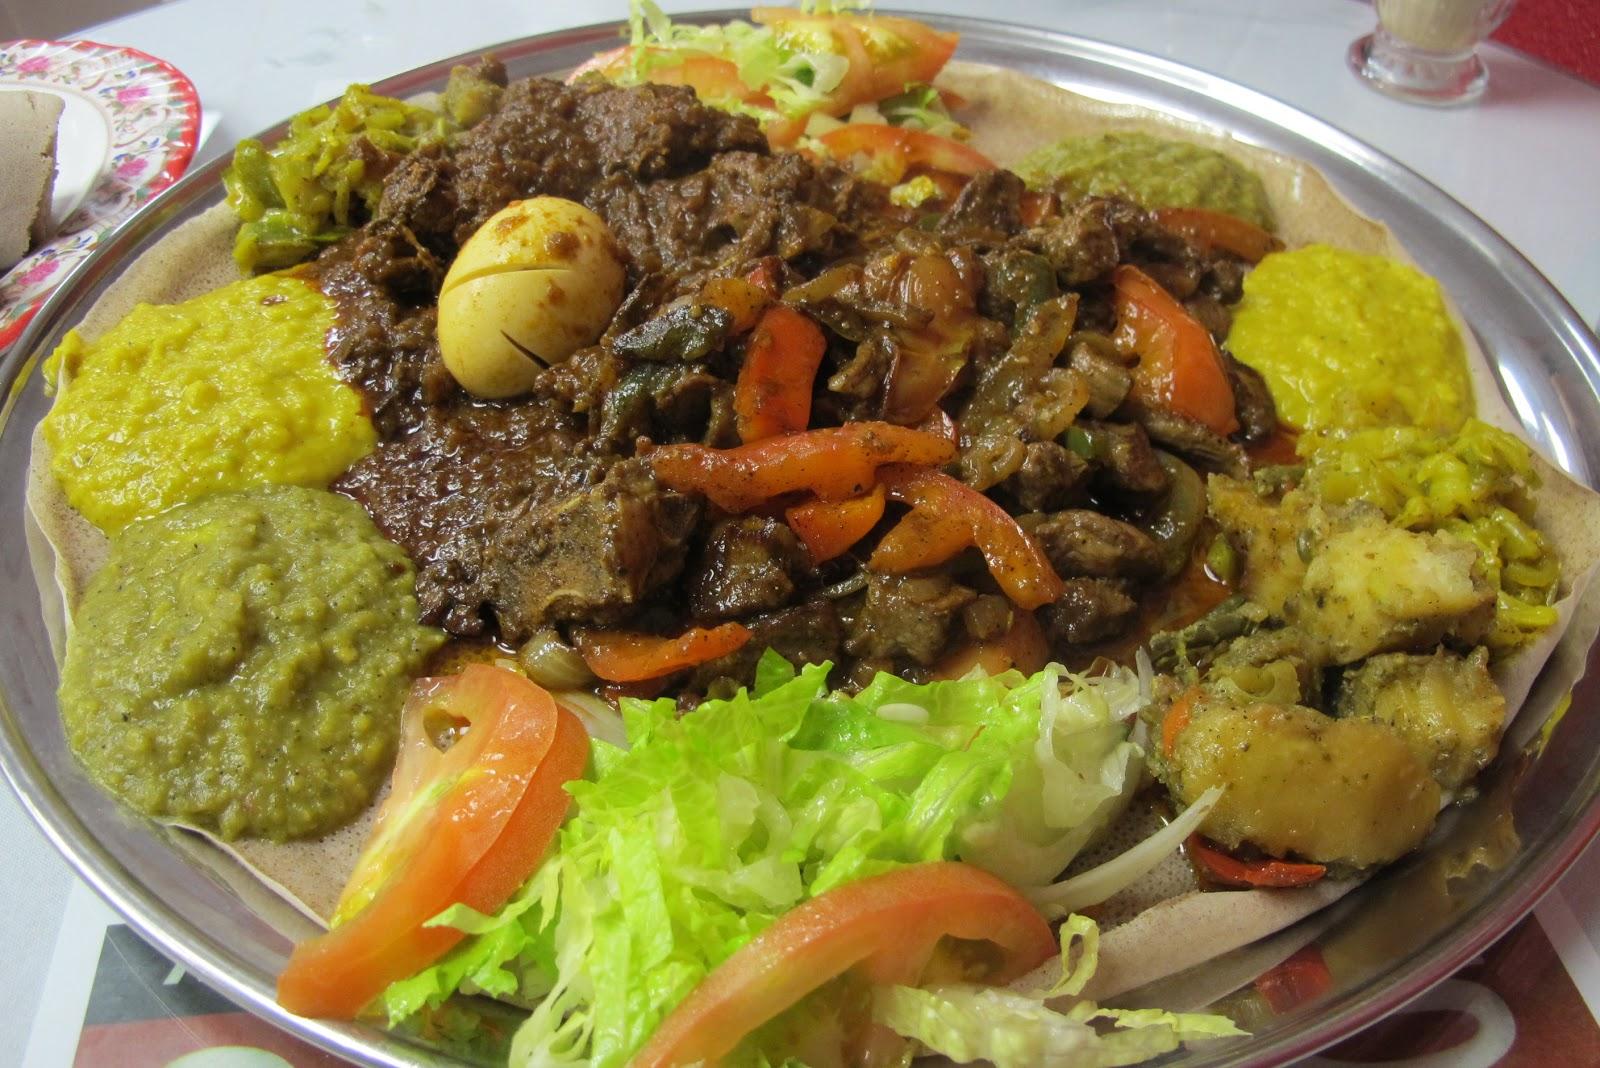 ethiopian food in portland me